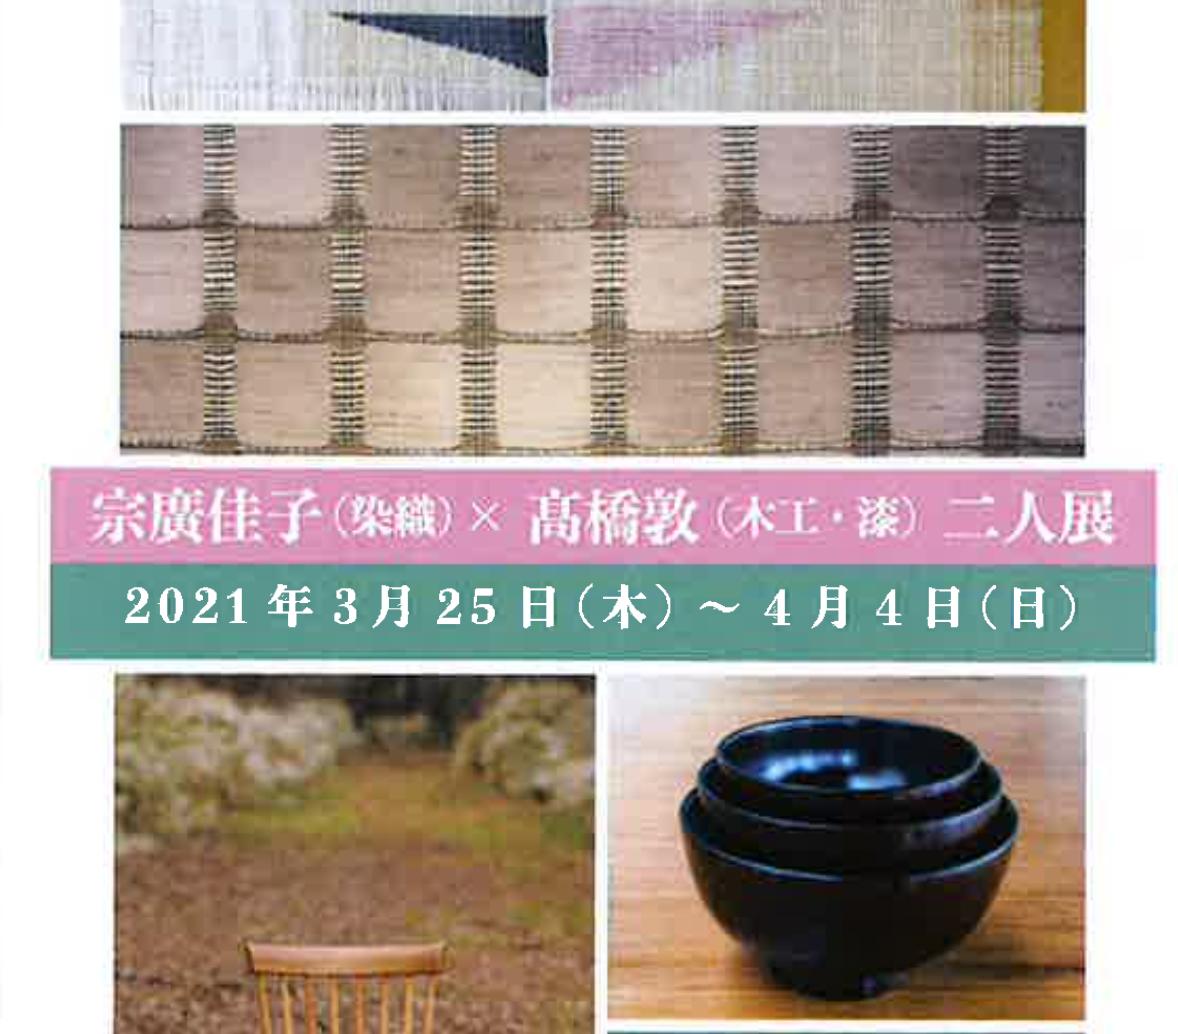 3/25(木)〜4/4(日)宗廣佳子さん(染織)×髙橋敦(木工・漆)二人展開催